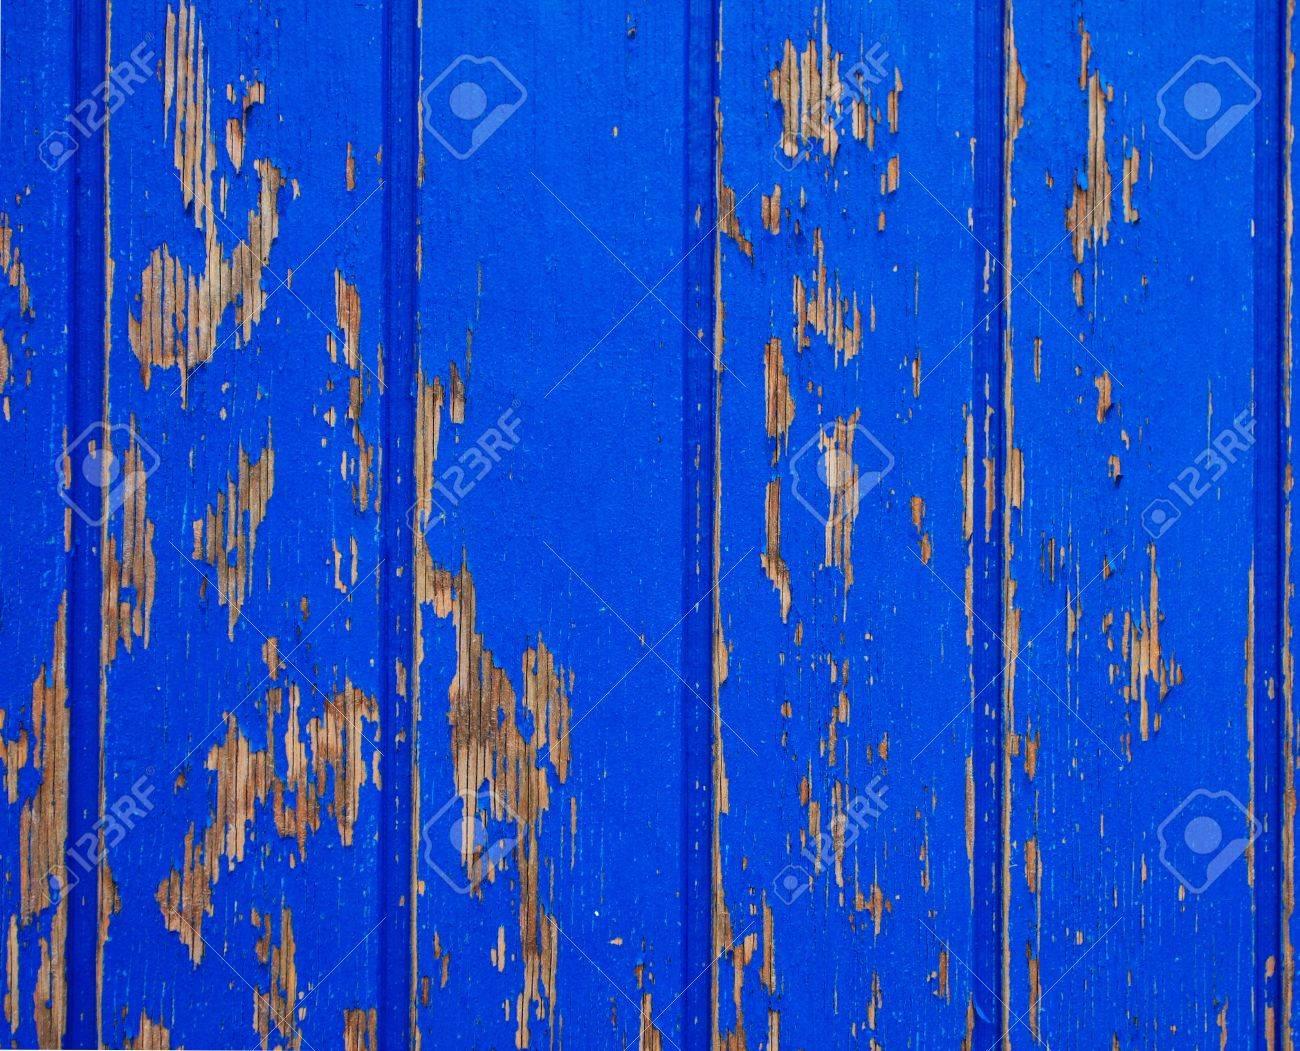 Blue painted wood background, flaky paint Stock Photo - 9857031